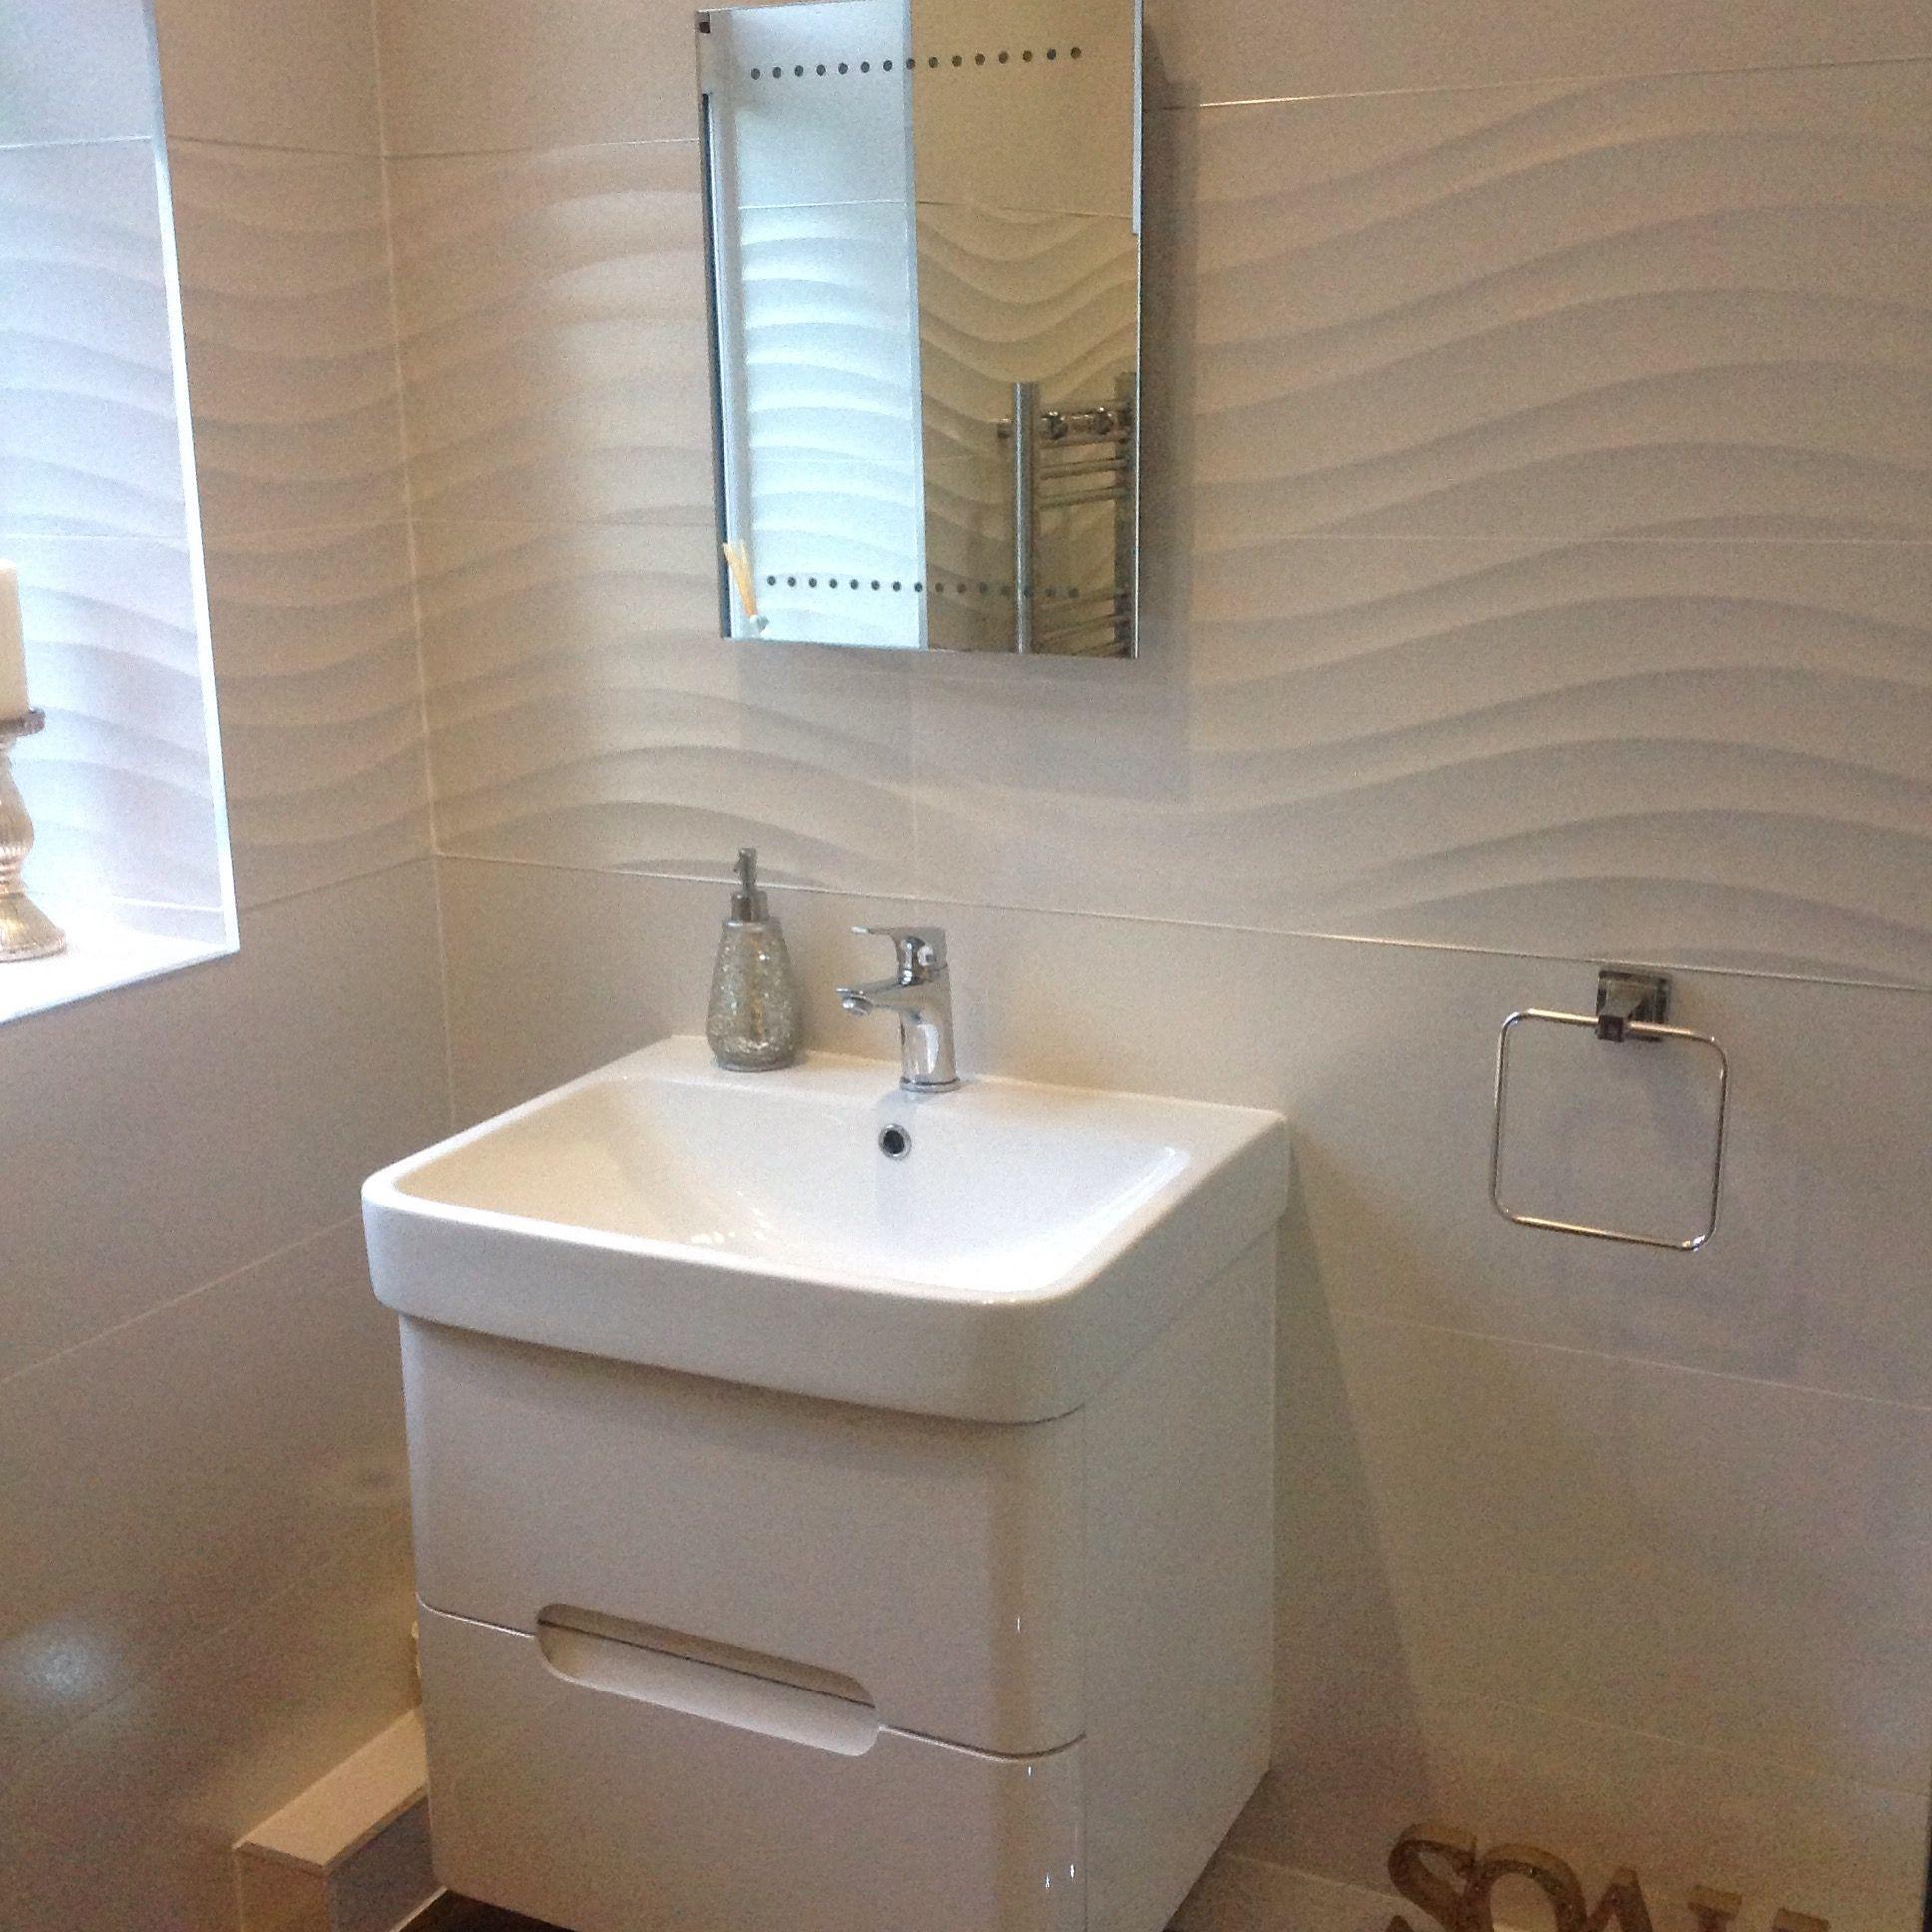 Image Idee Salle De Bain De The Cornwall Tile Co Du Tableau Porcelanosa Tiles Idees Salle De Bain Salle De Bain